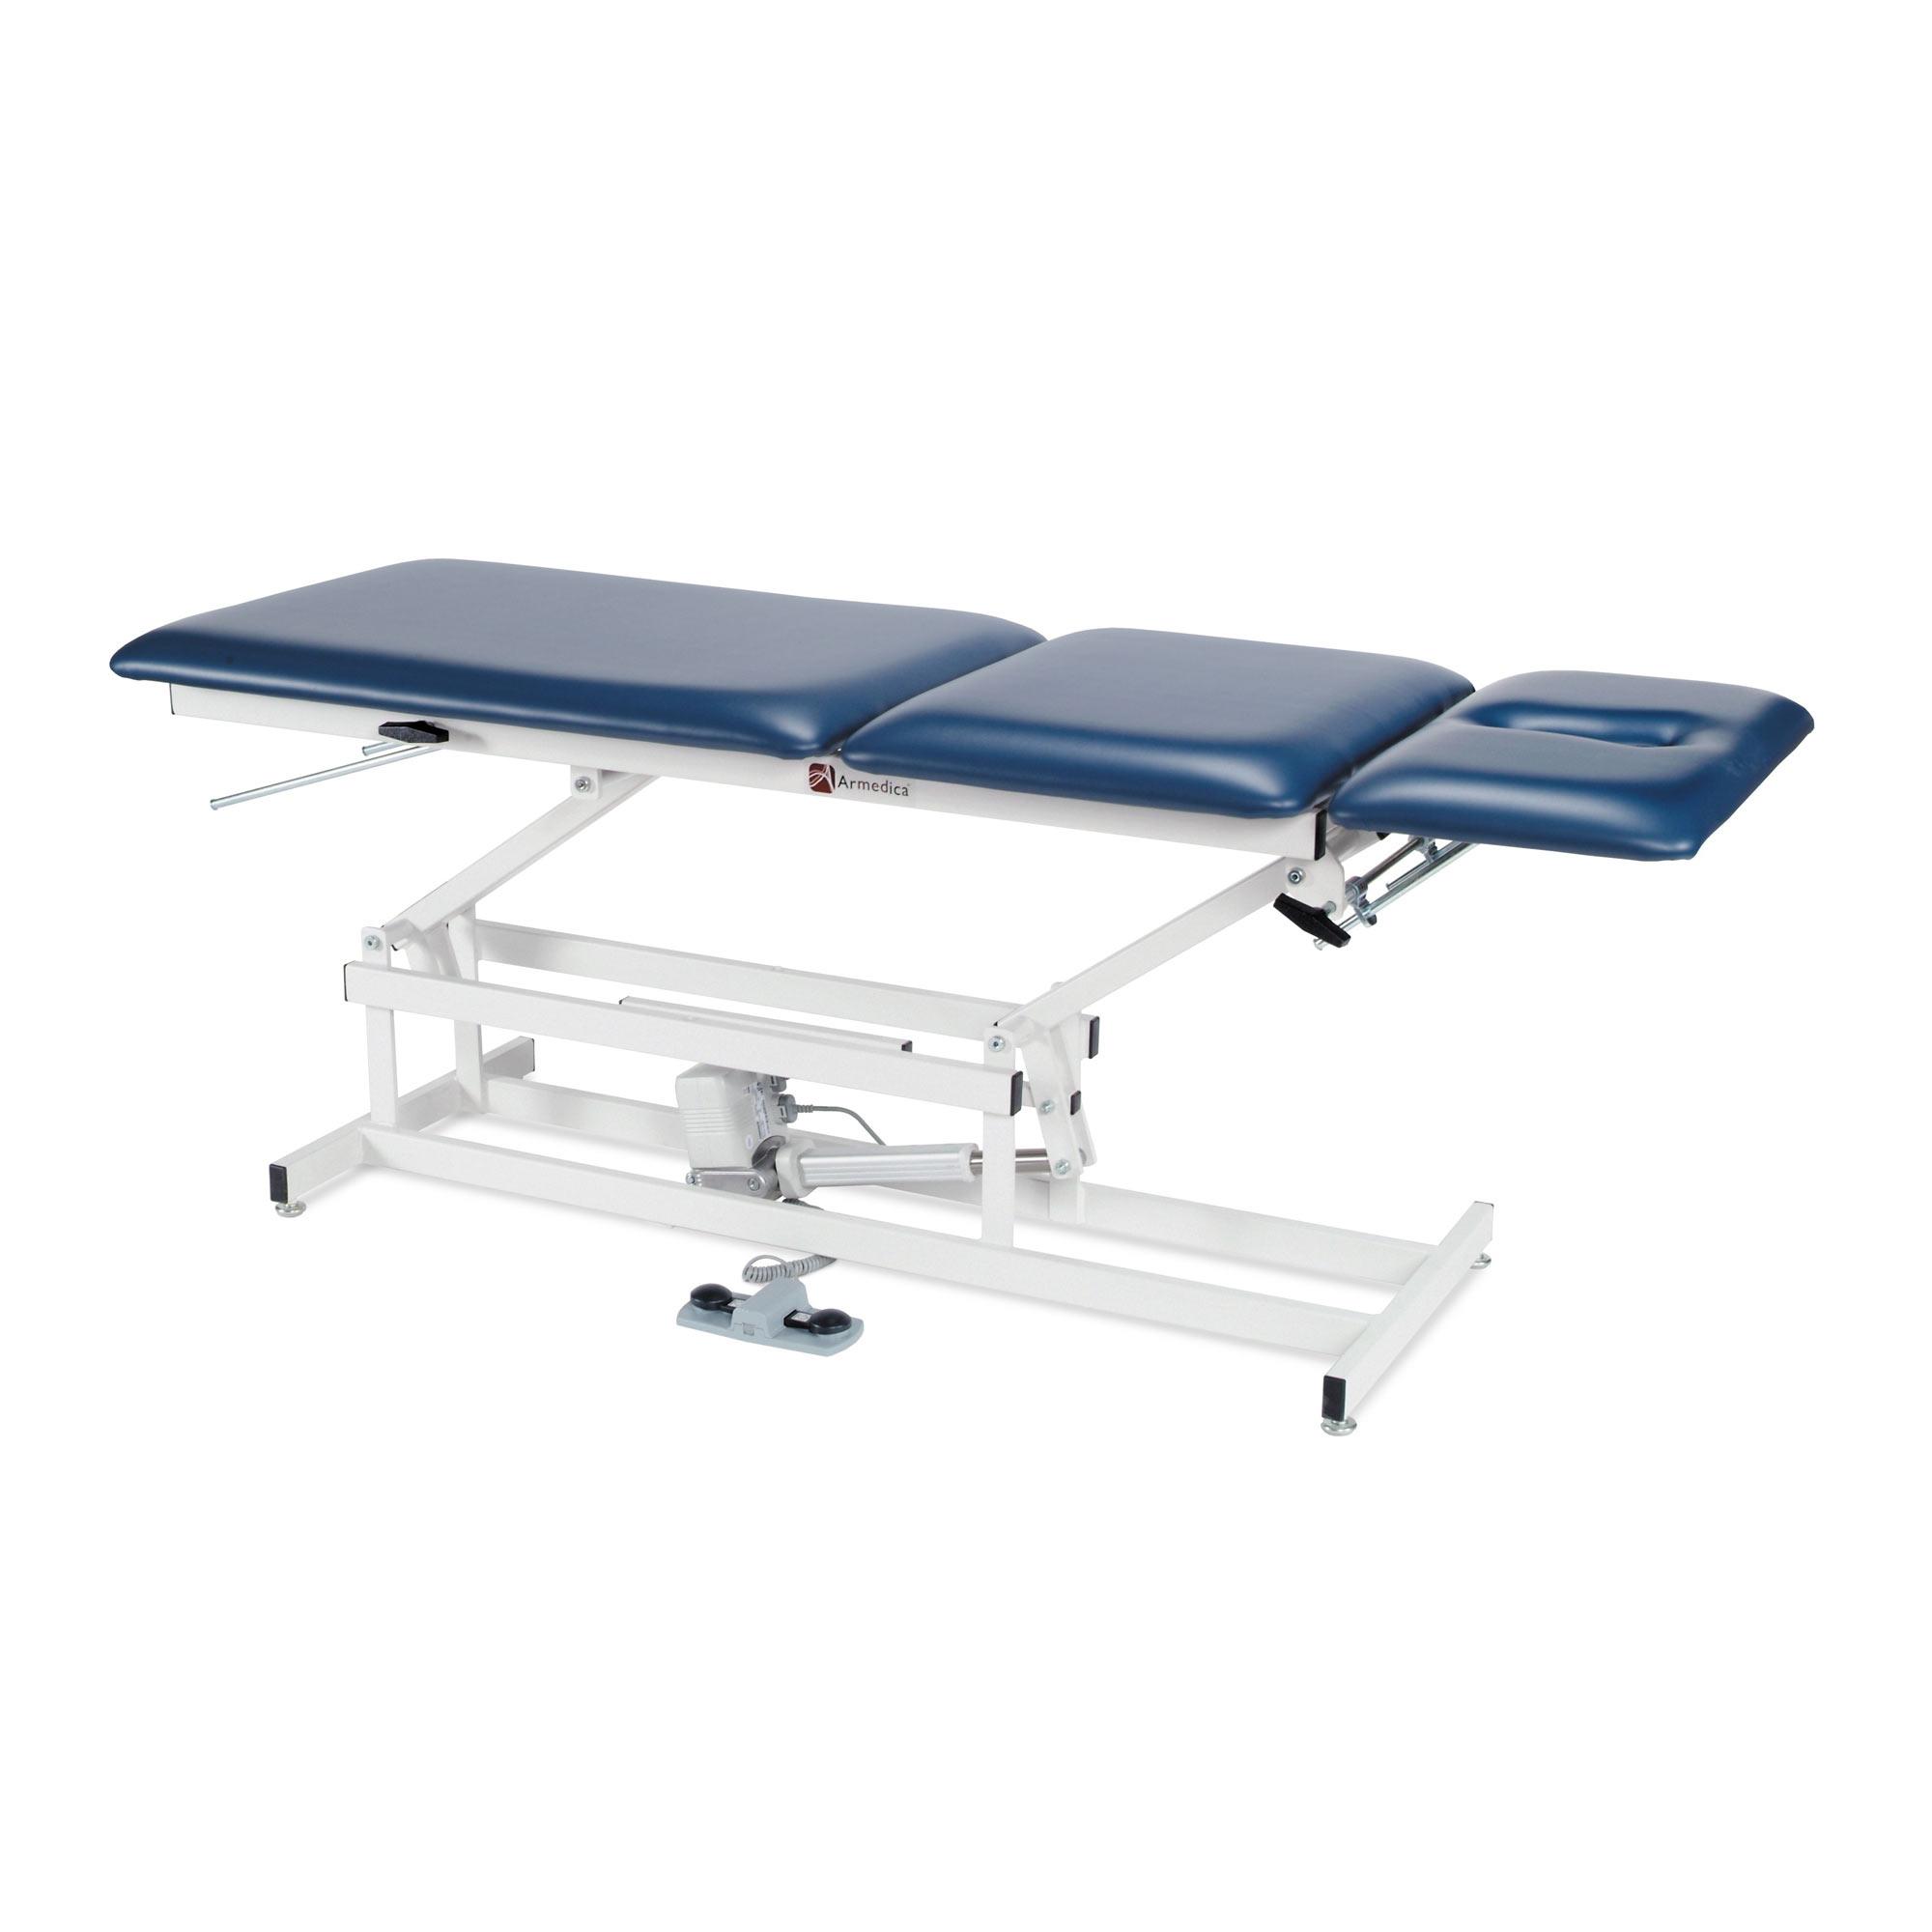 Armedica AM-334 bariatric treatment table